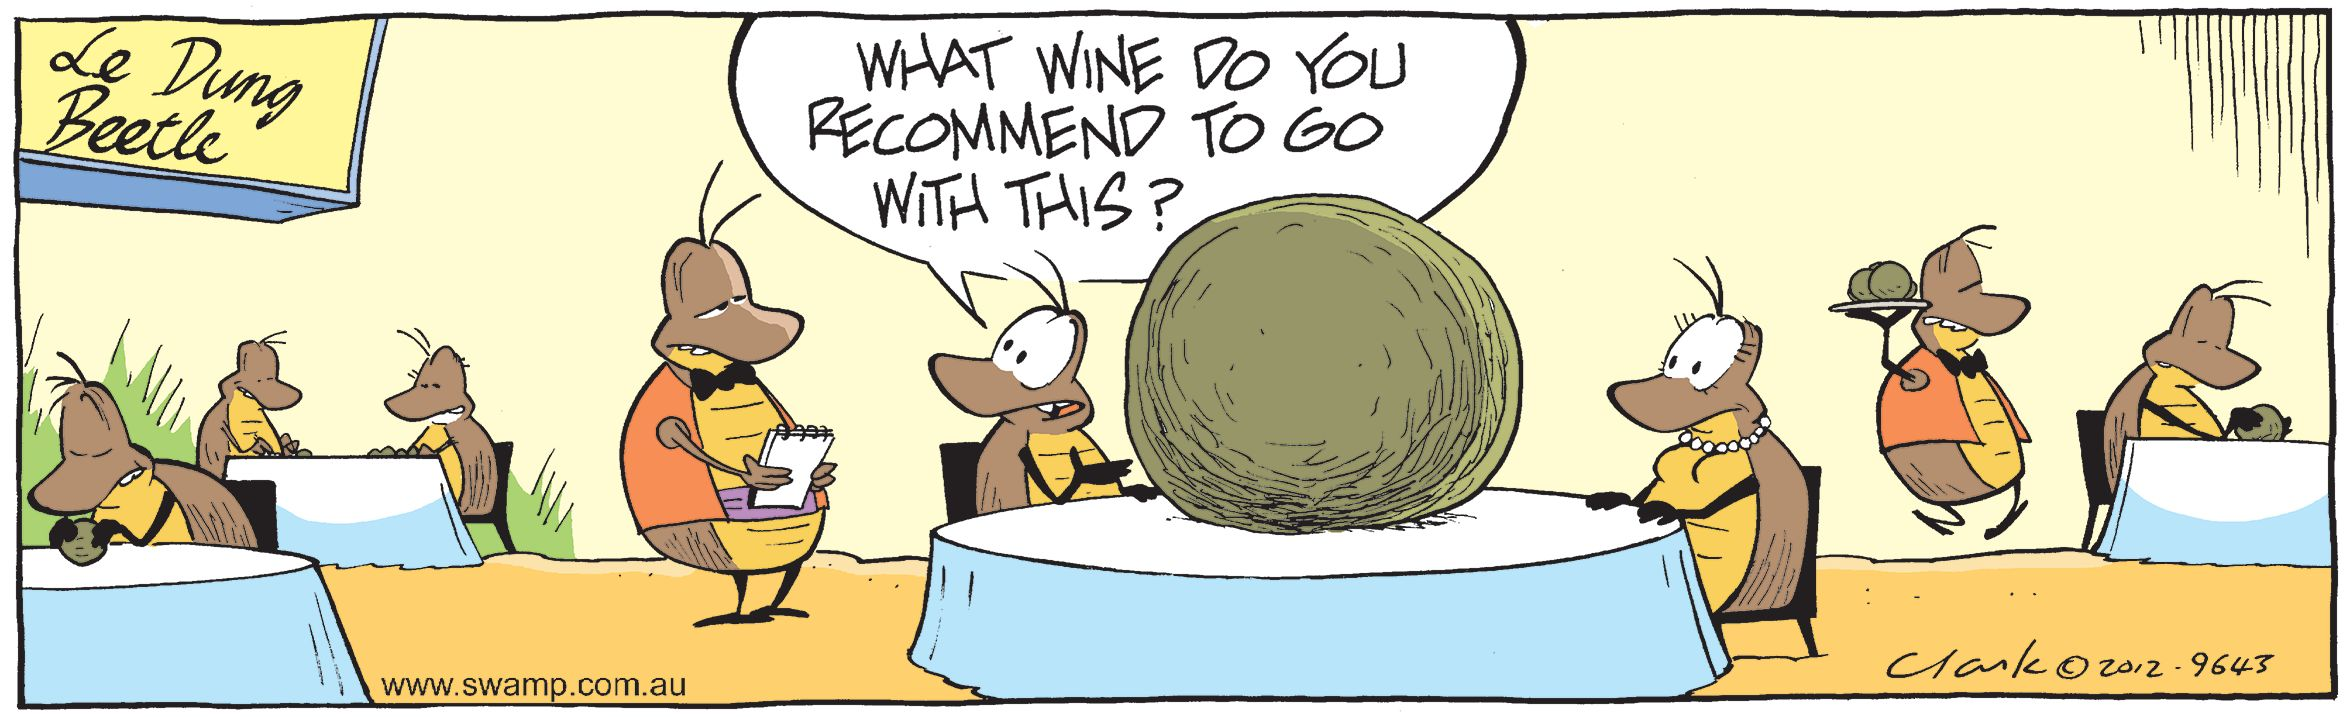 Wine with Dinner Comic